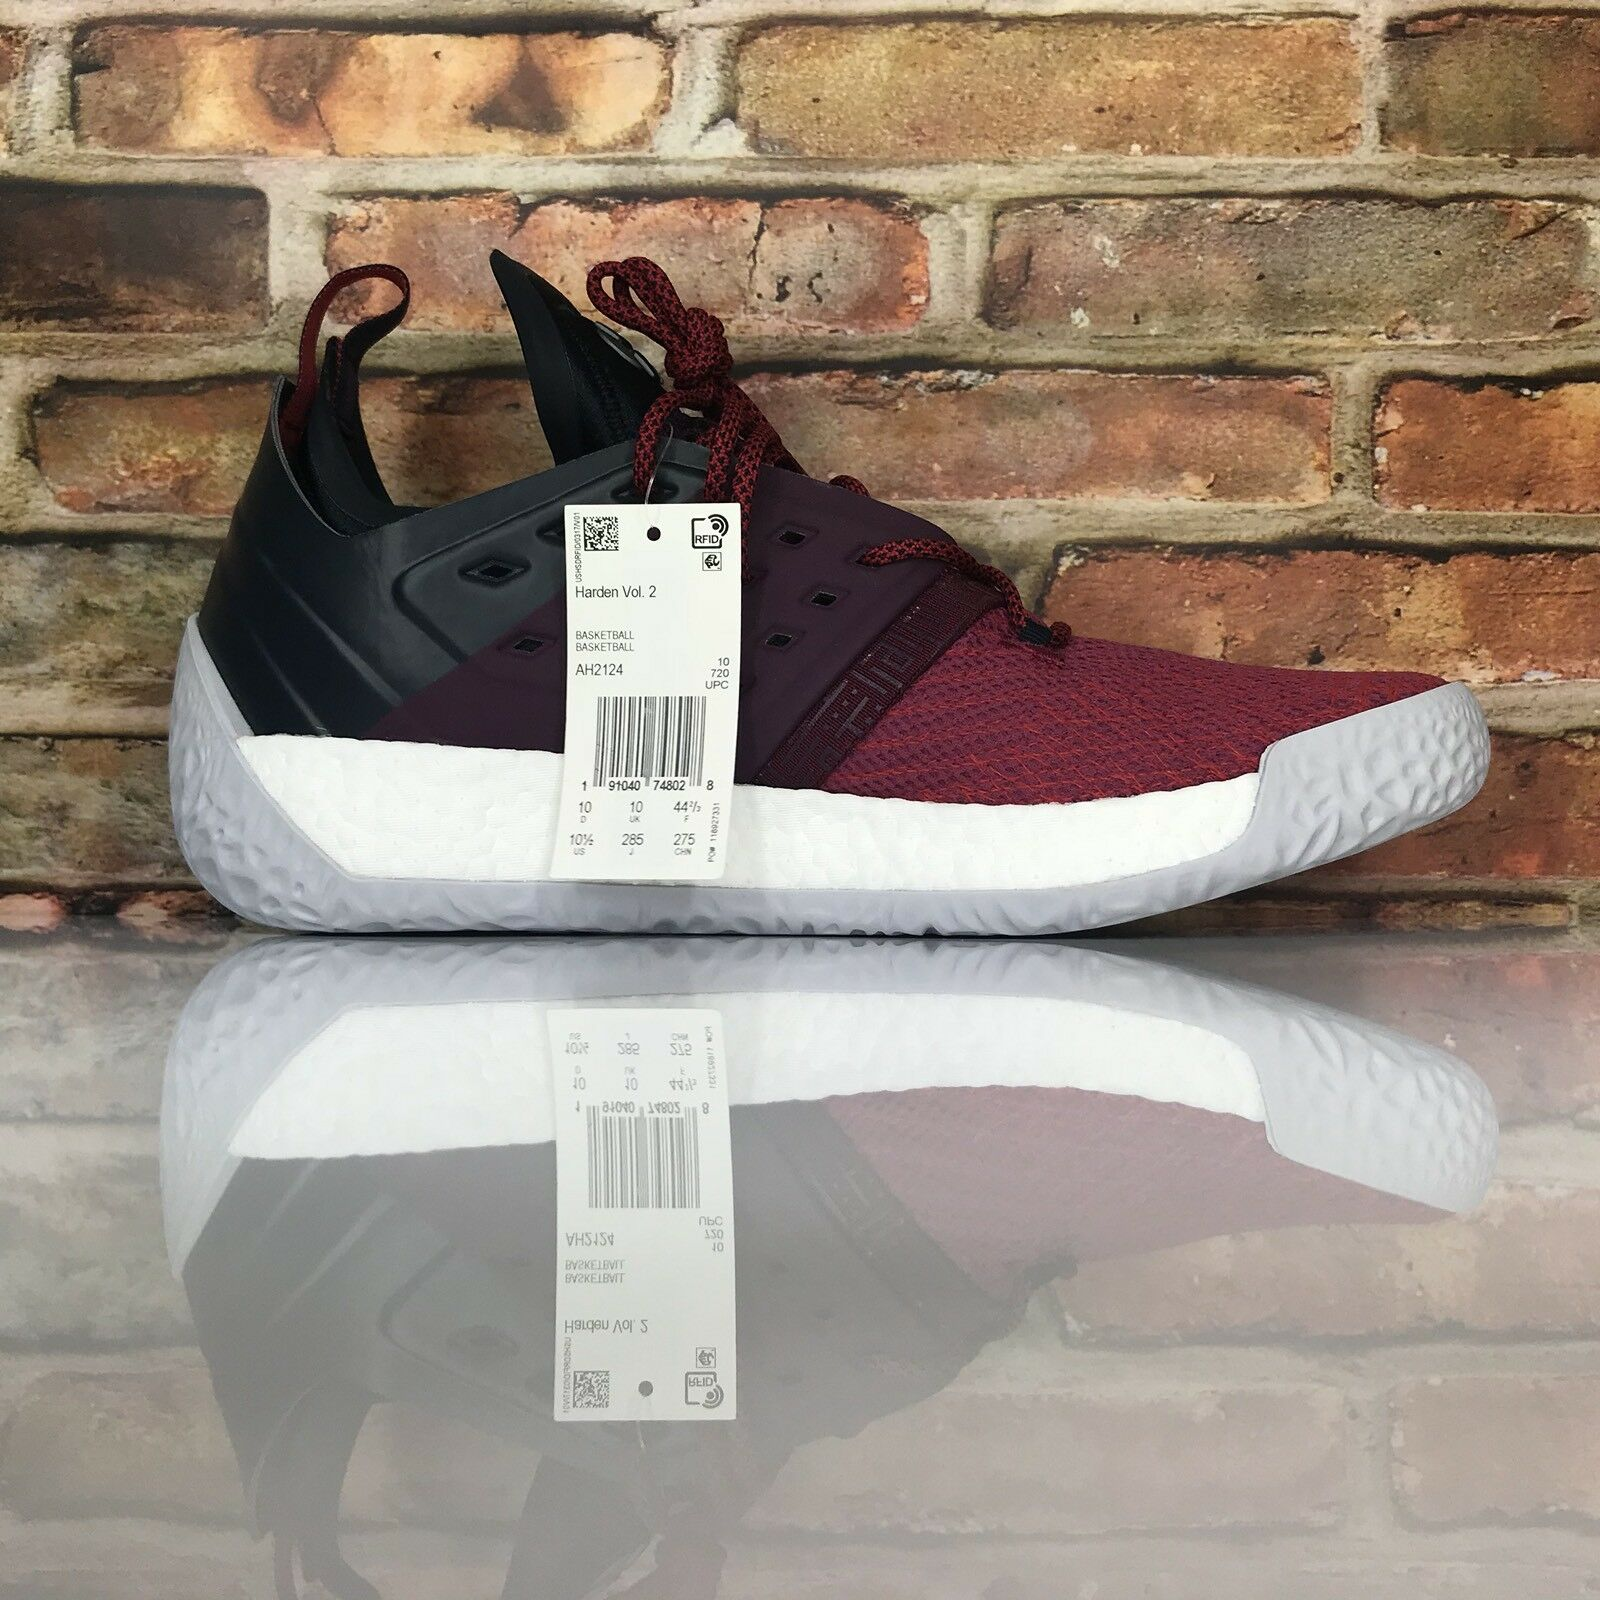 Adidas james harden harden harden mvp vol. 2 uomini 9,5 scarpe da basket amaranto ah2124 ignite cd05b1